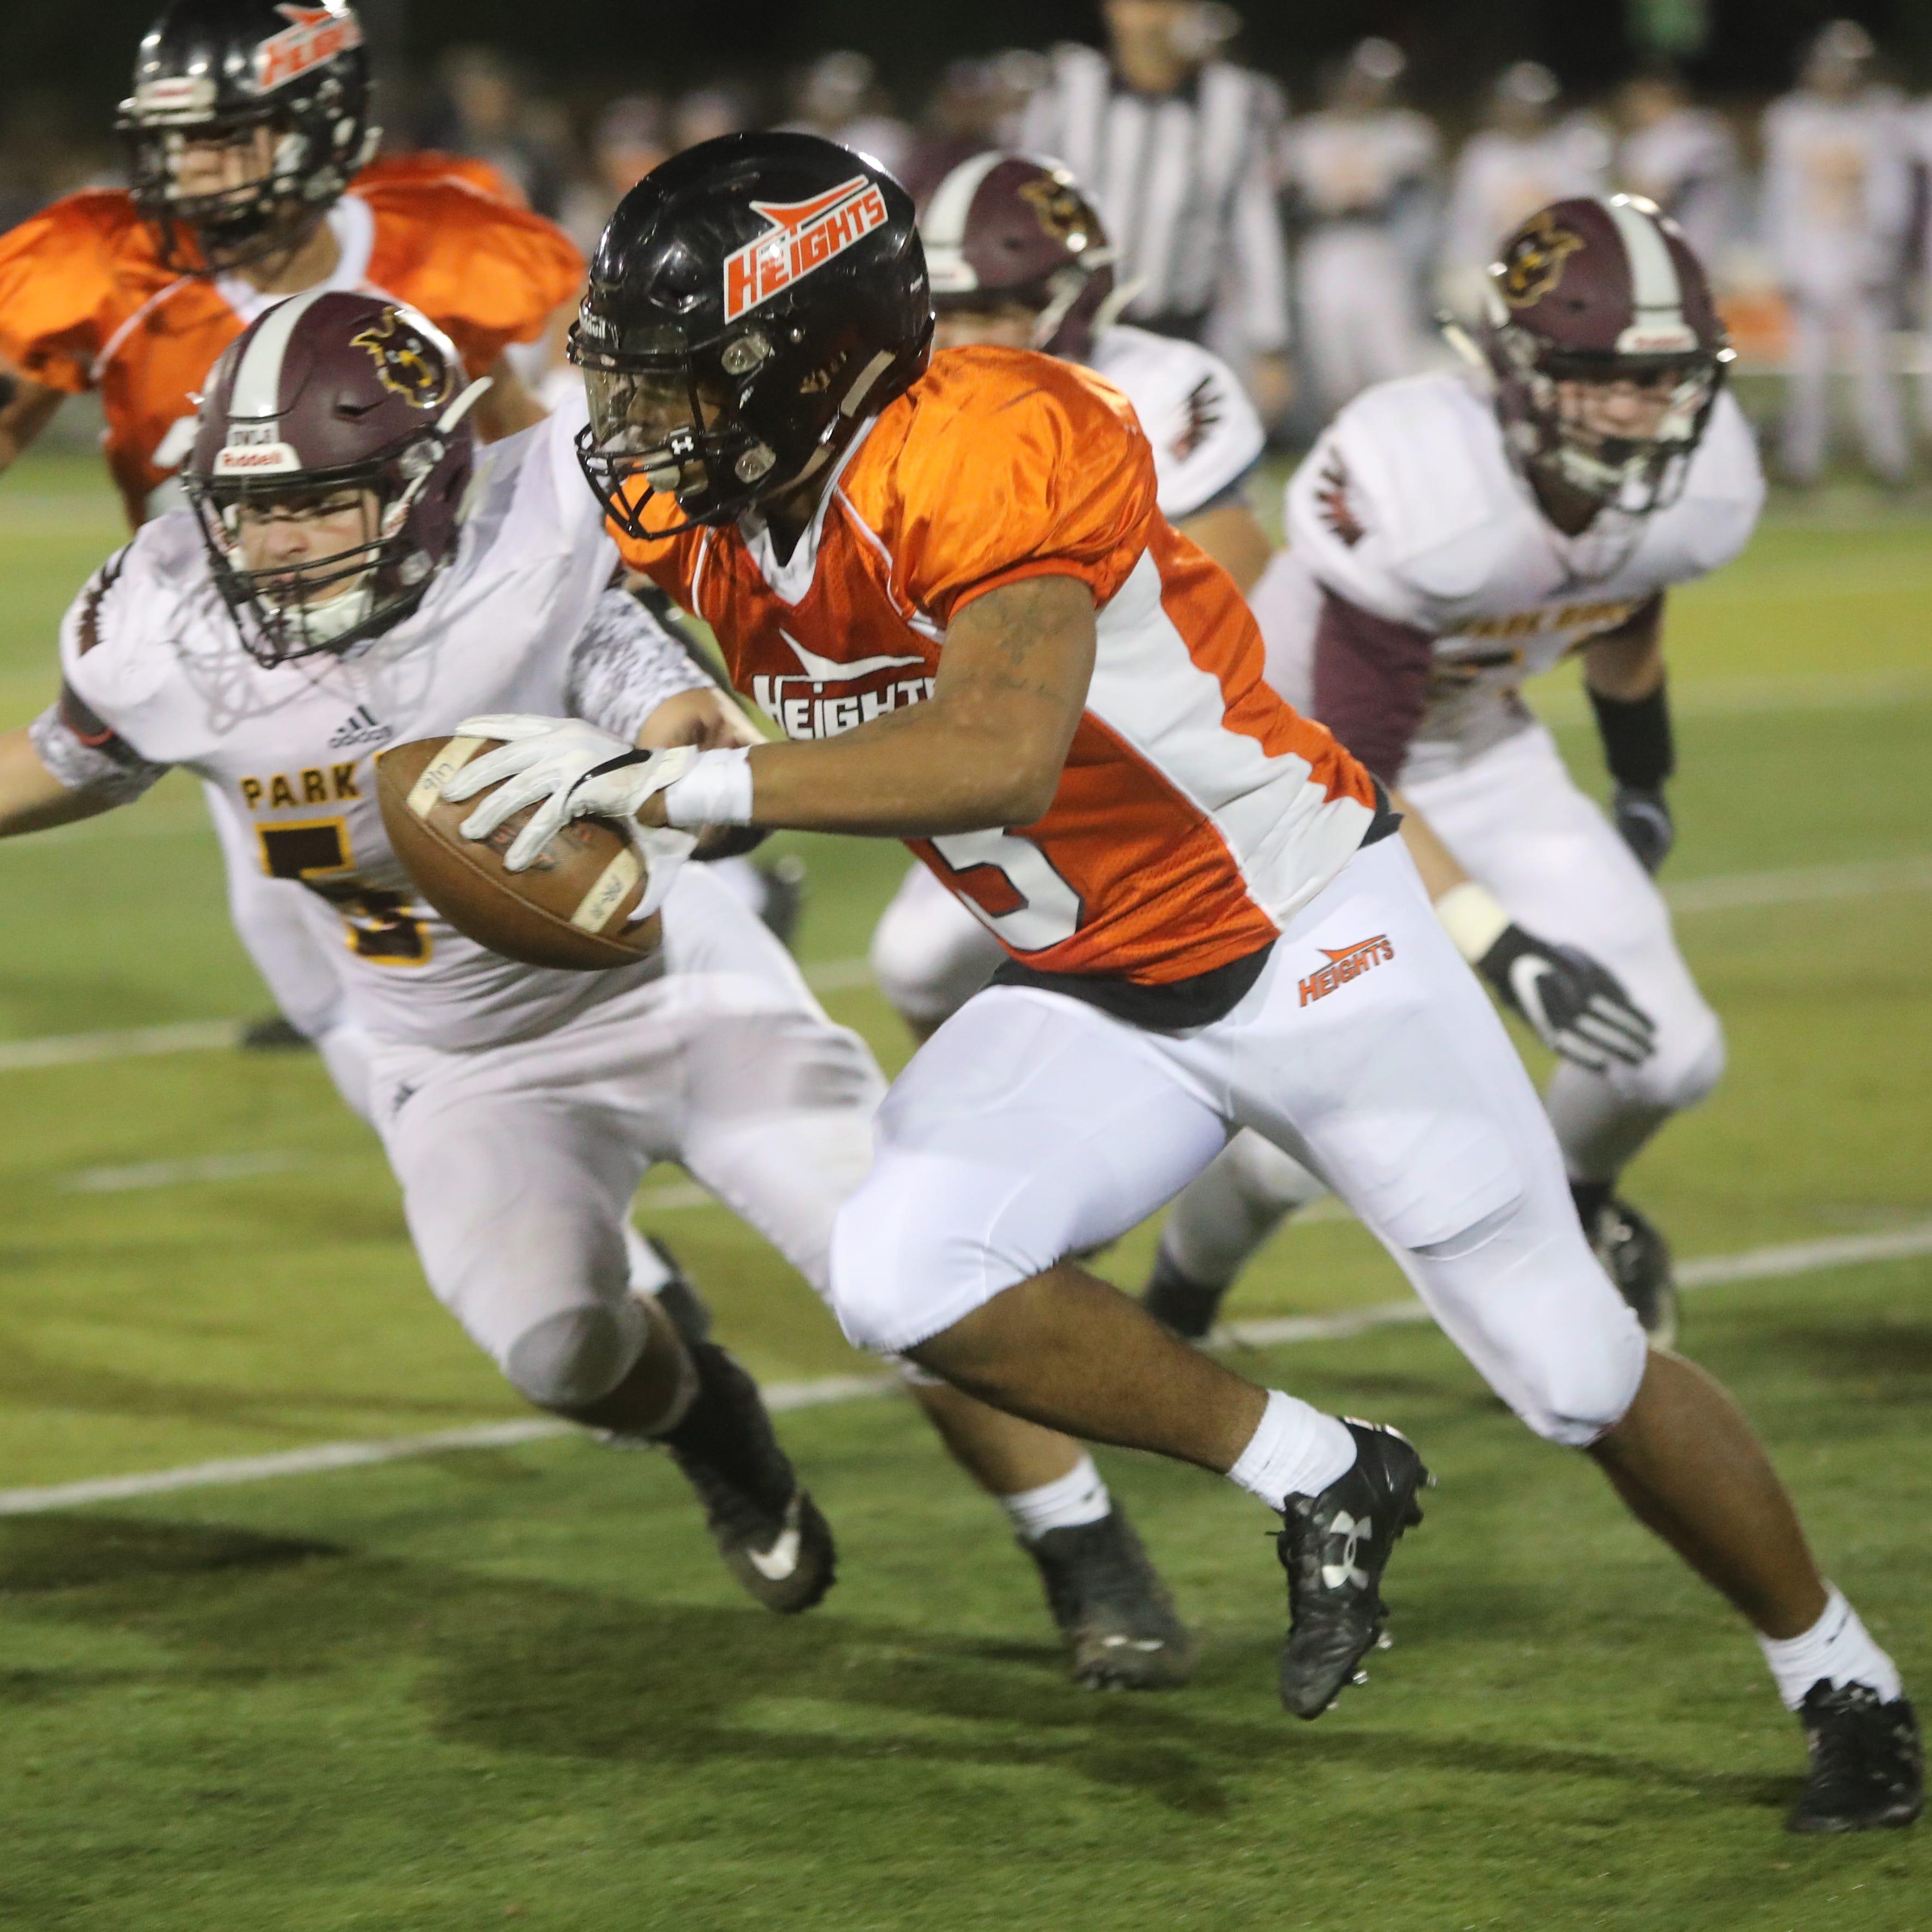 Hasbrouck Heights football earns third NJIC final bid with win over Park Ridge